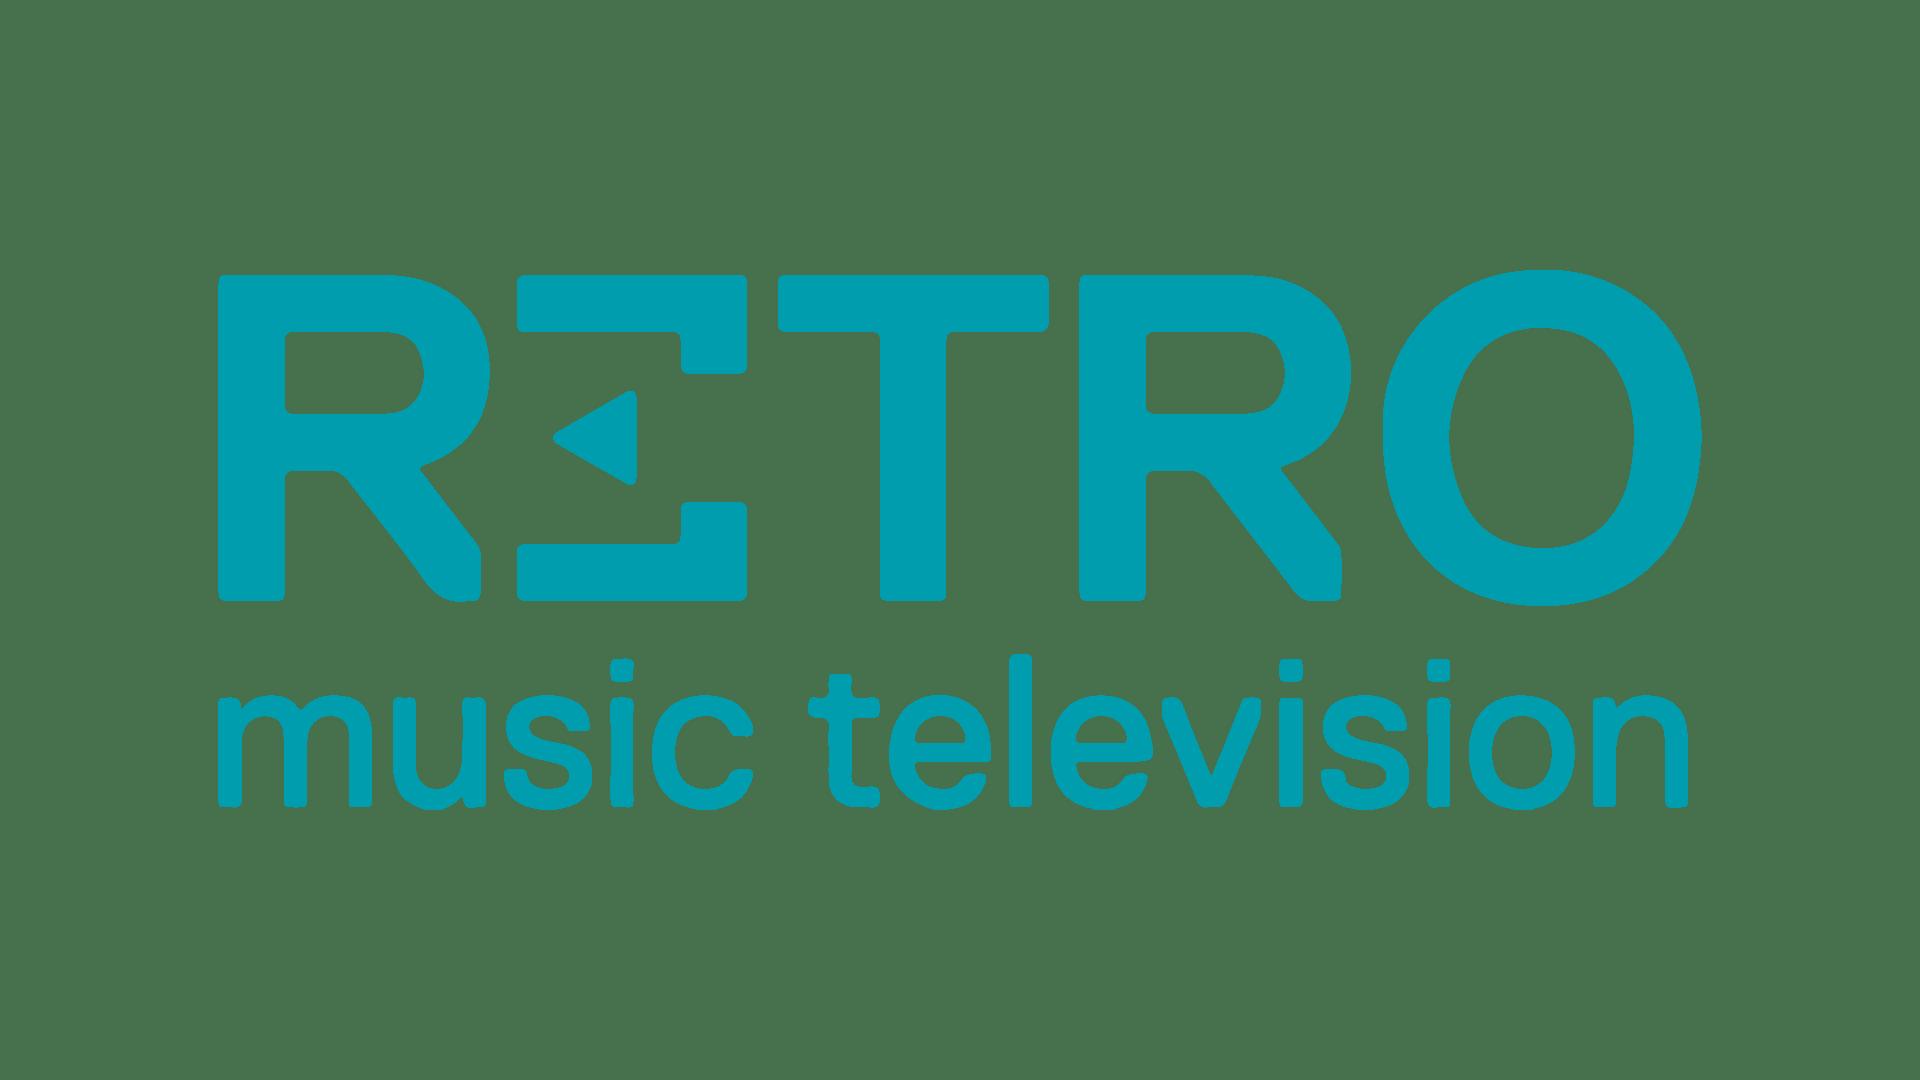 Retro Music Television Live TV, Online